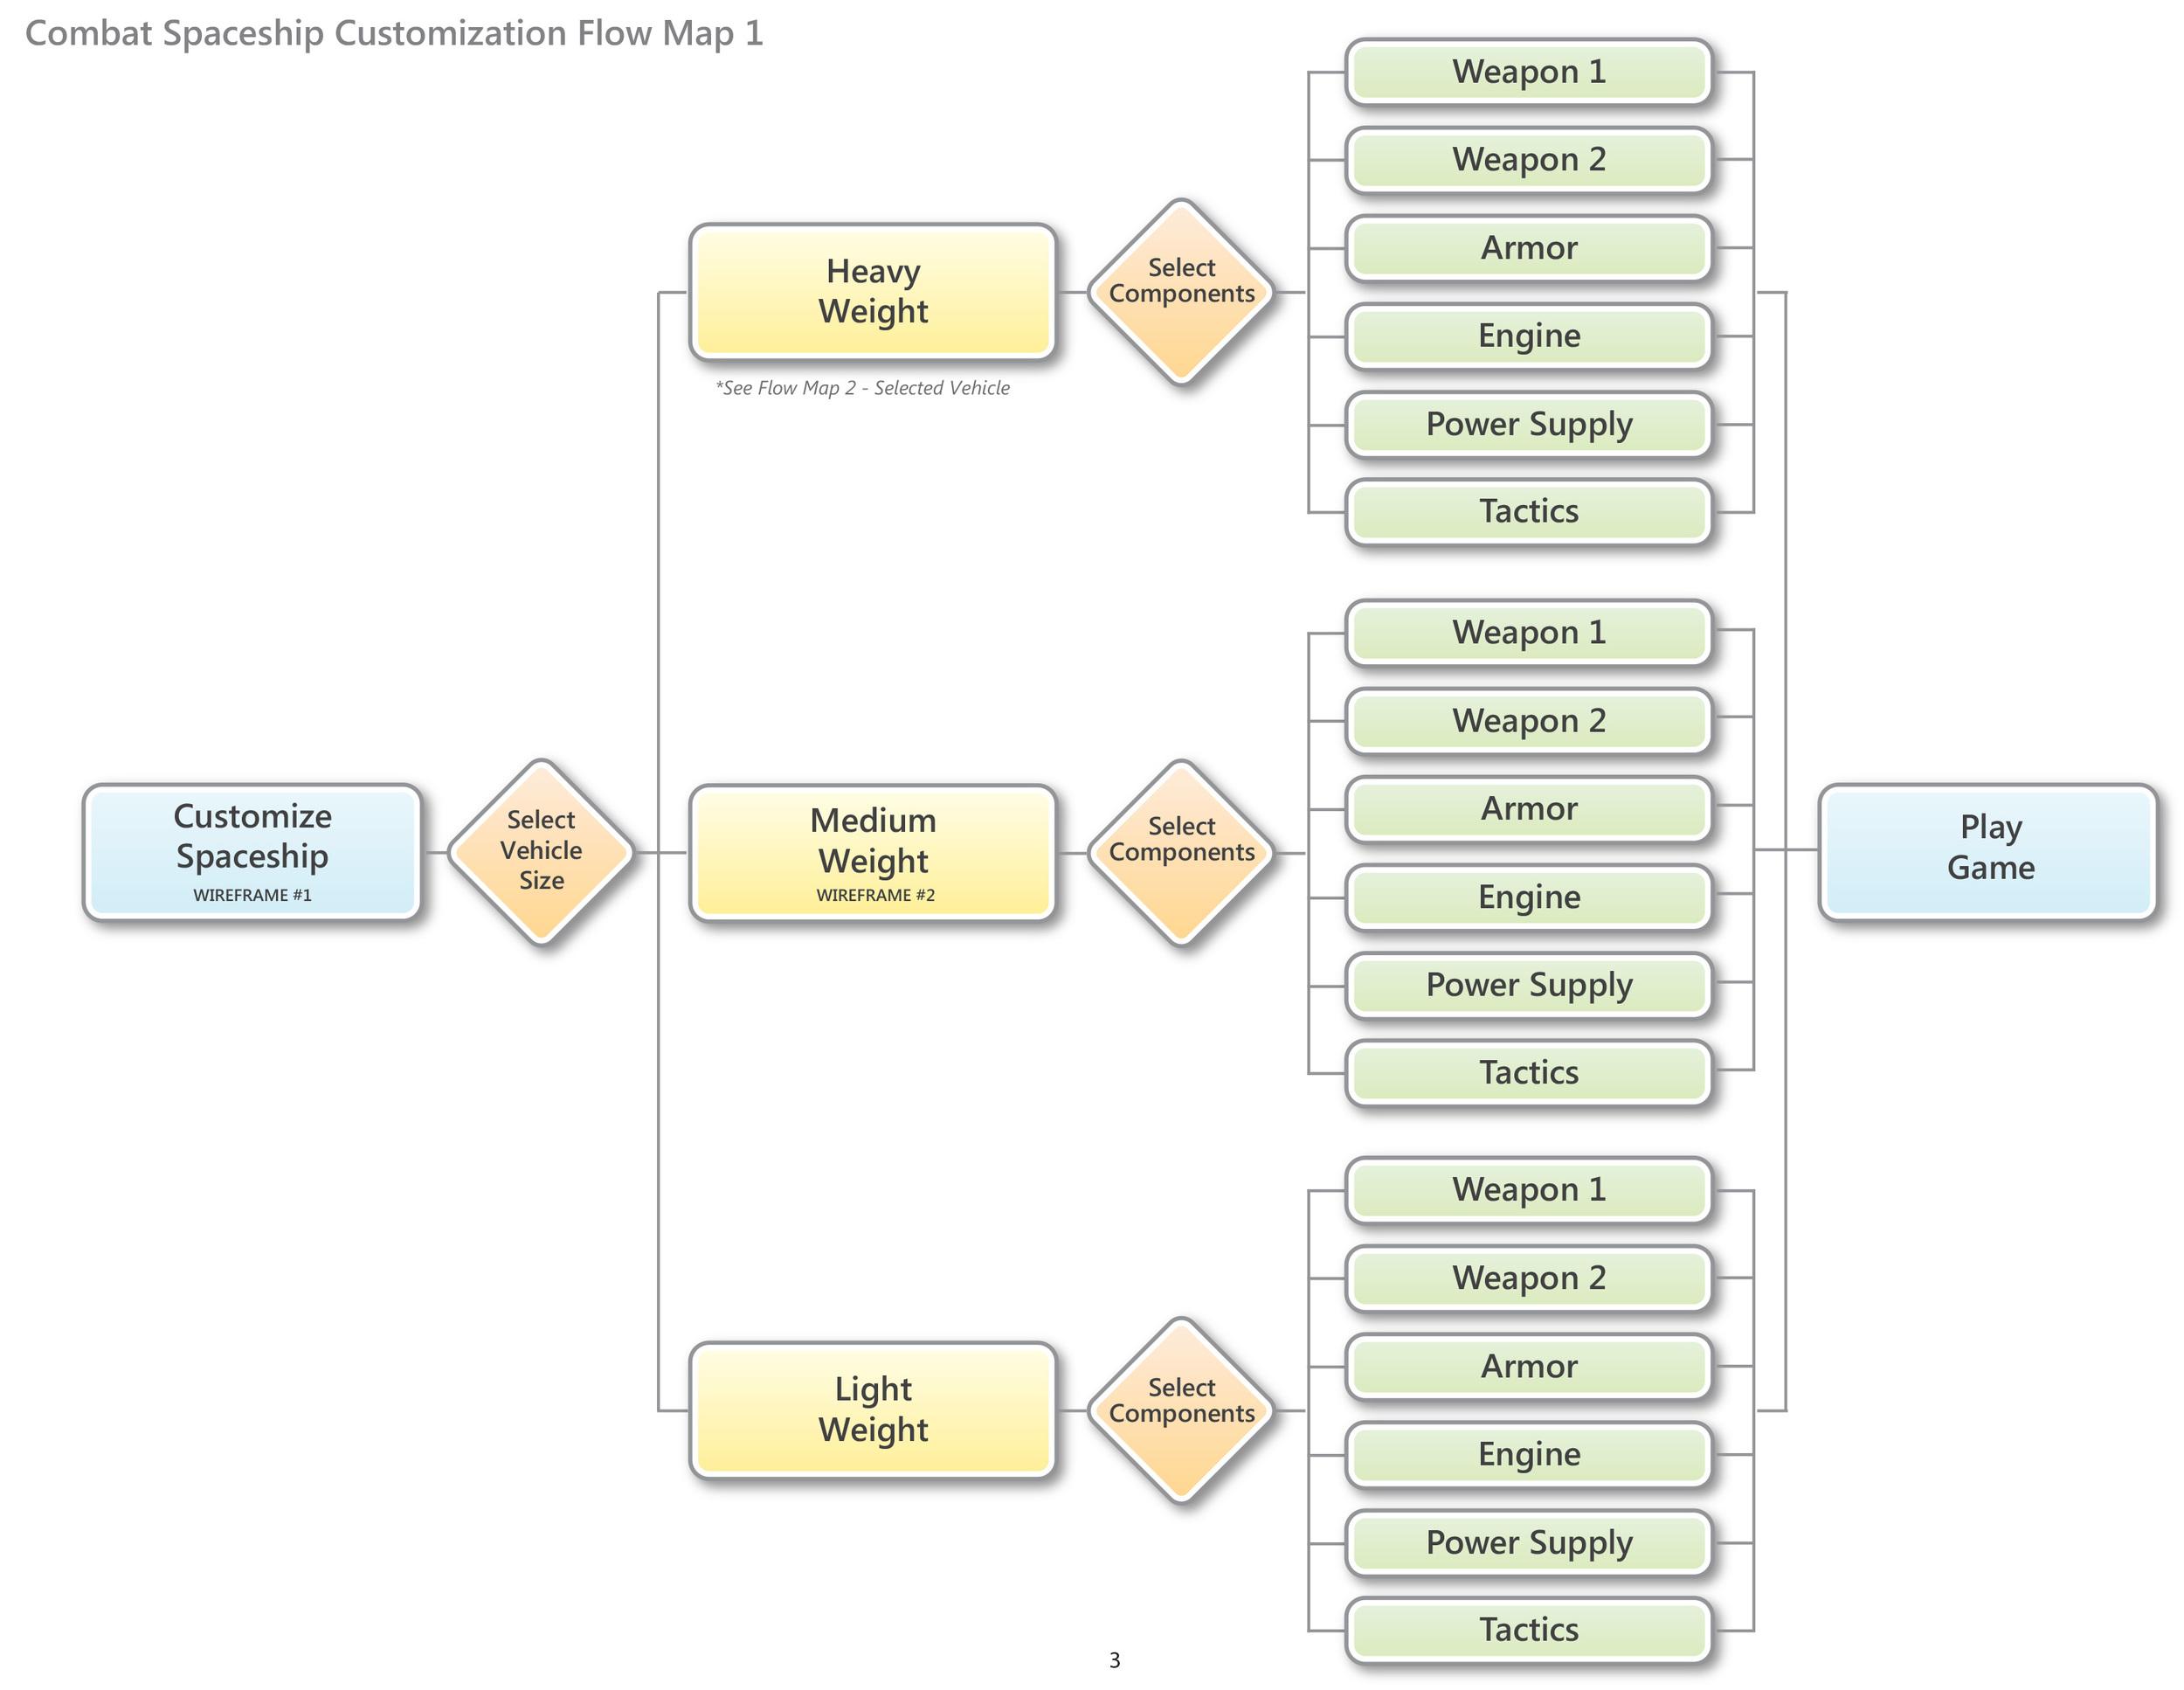 Flow Map 1